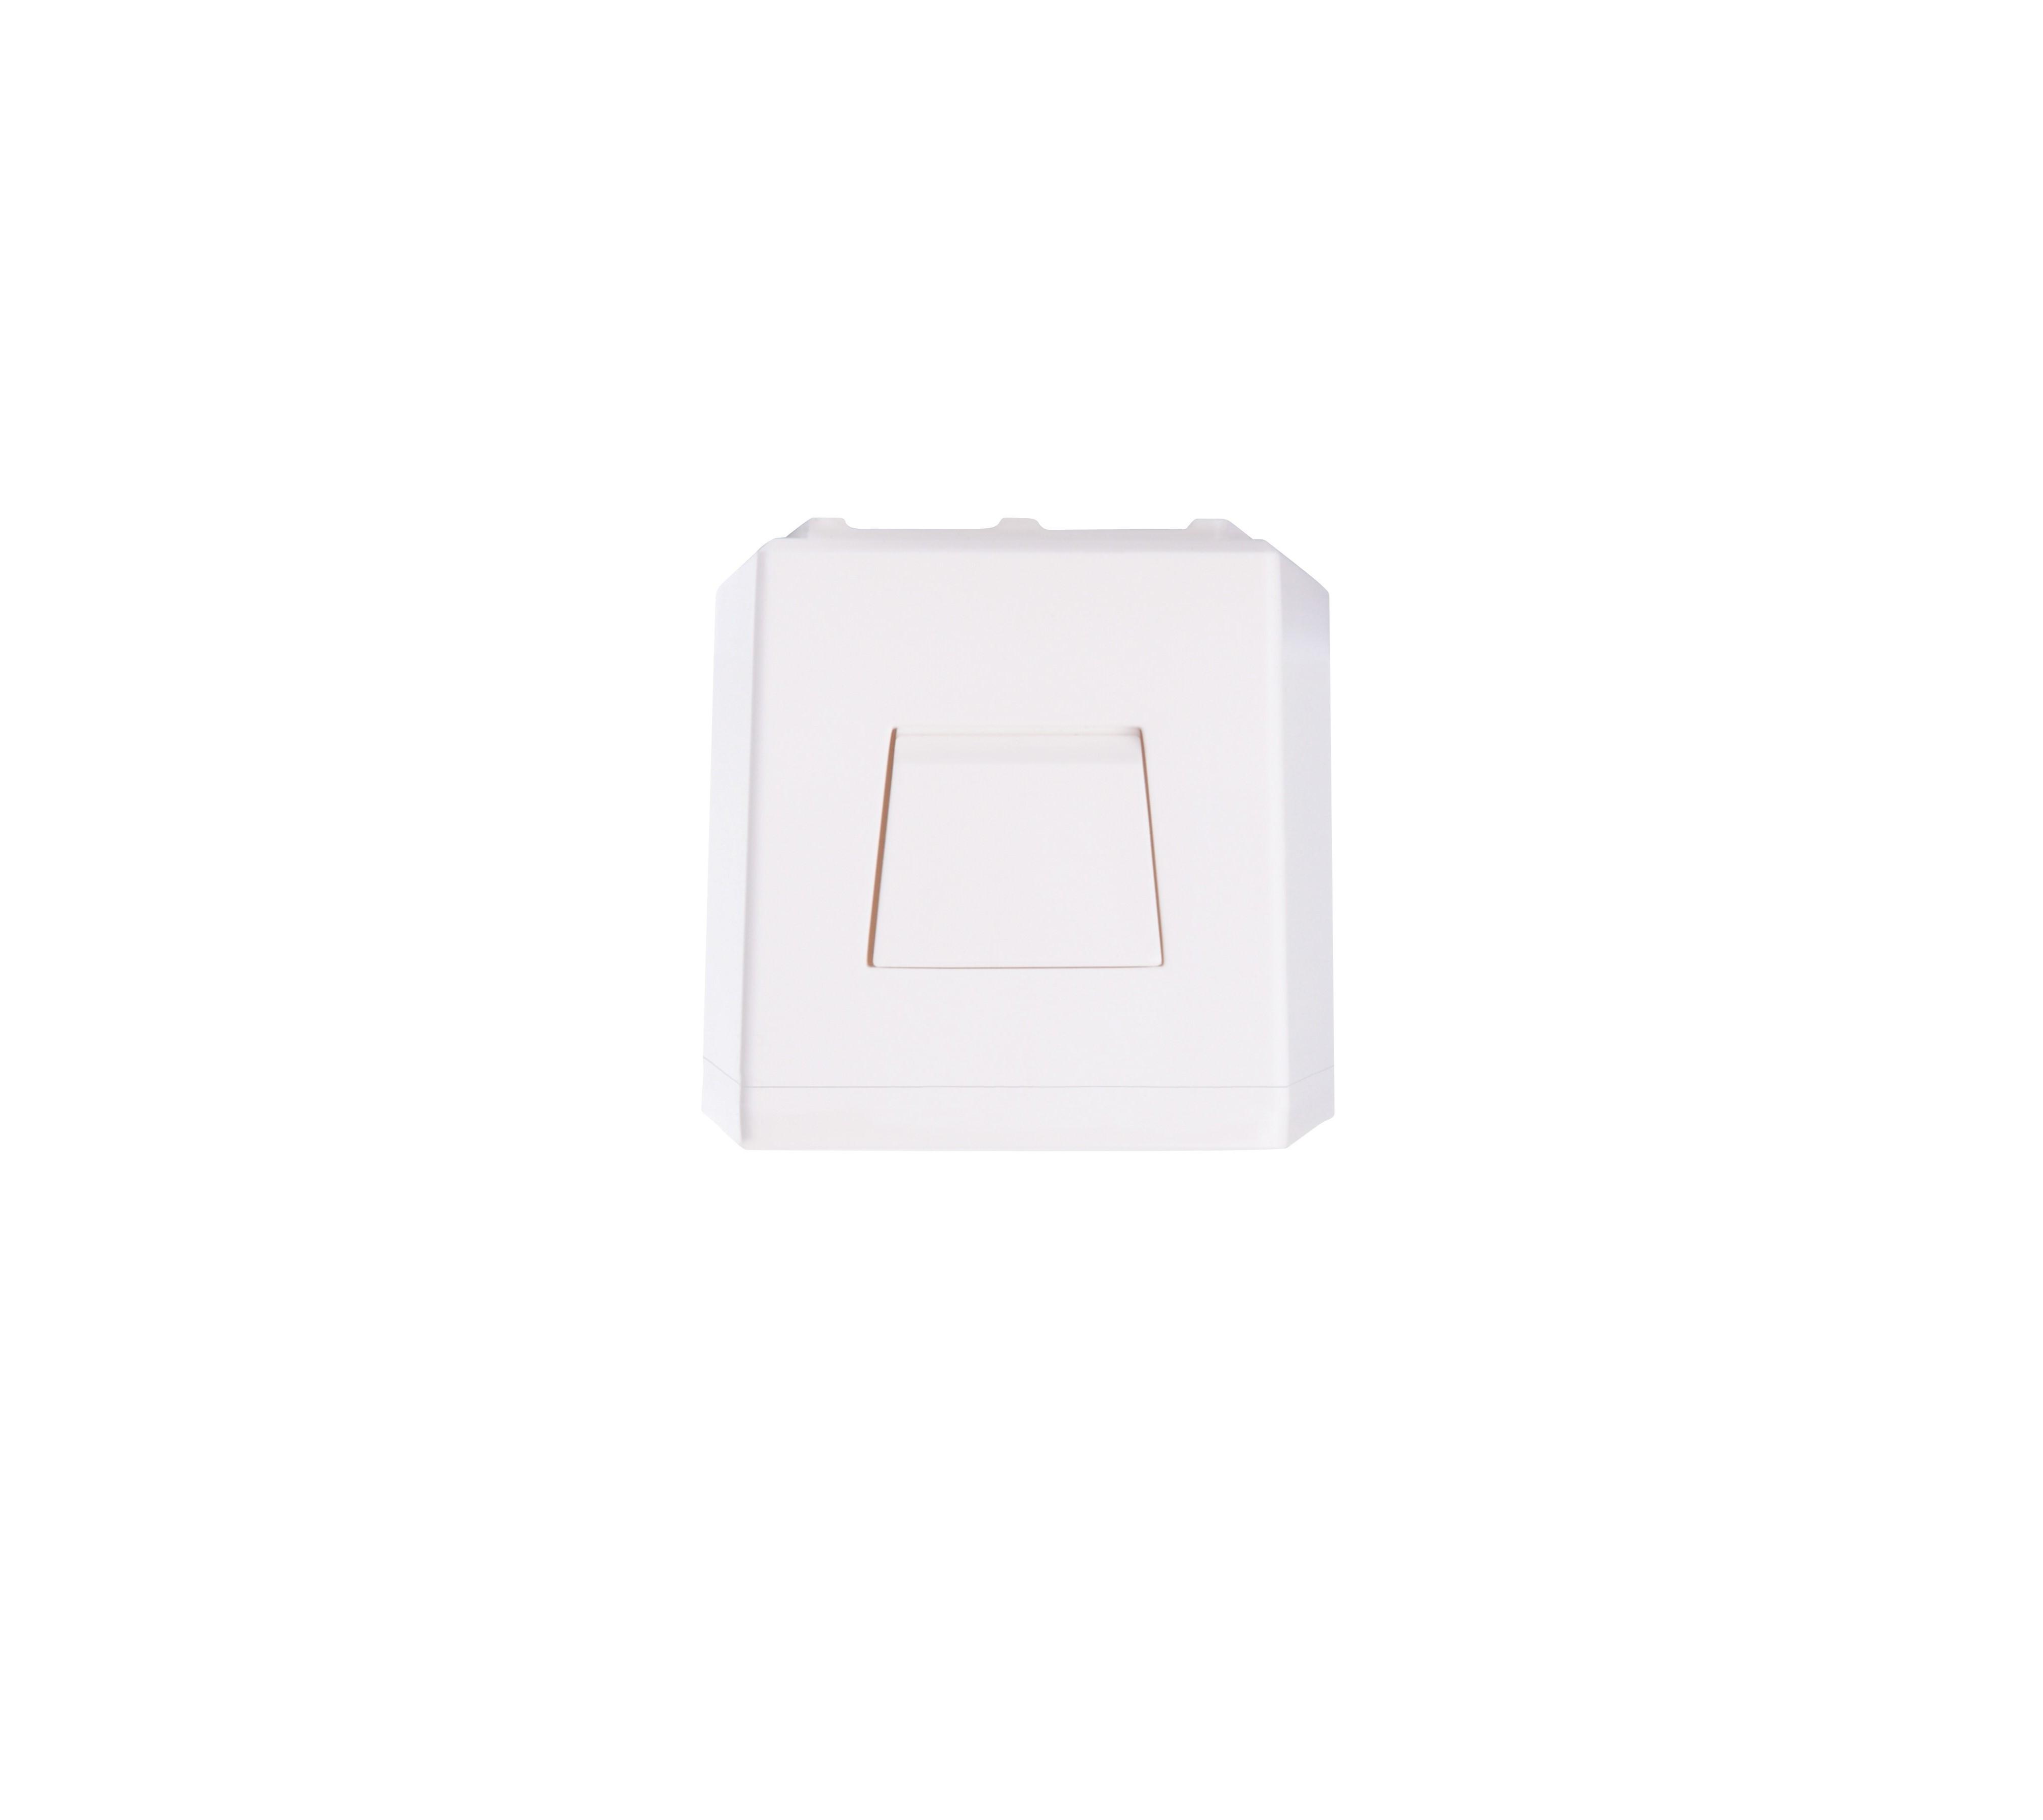 Lampa antipanica led Intelight 94569   2h nementinut test automat 1